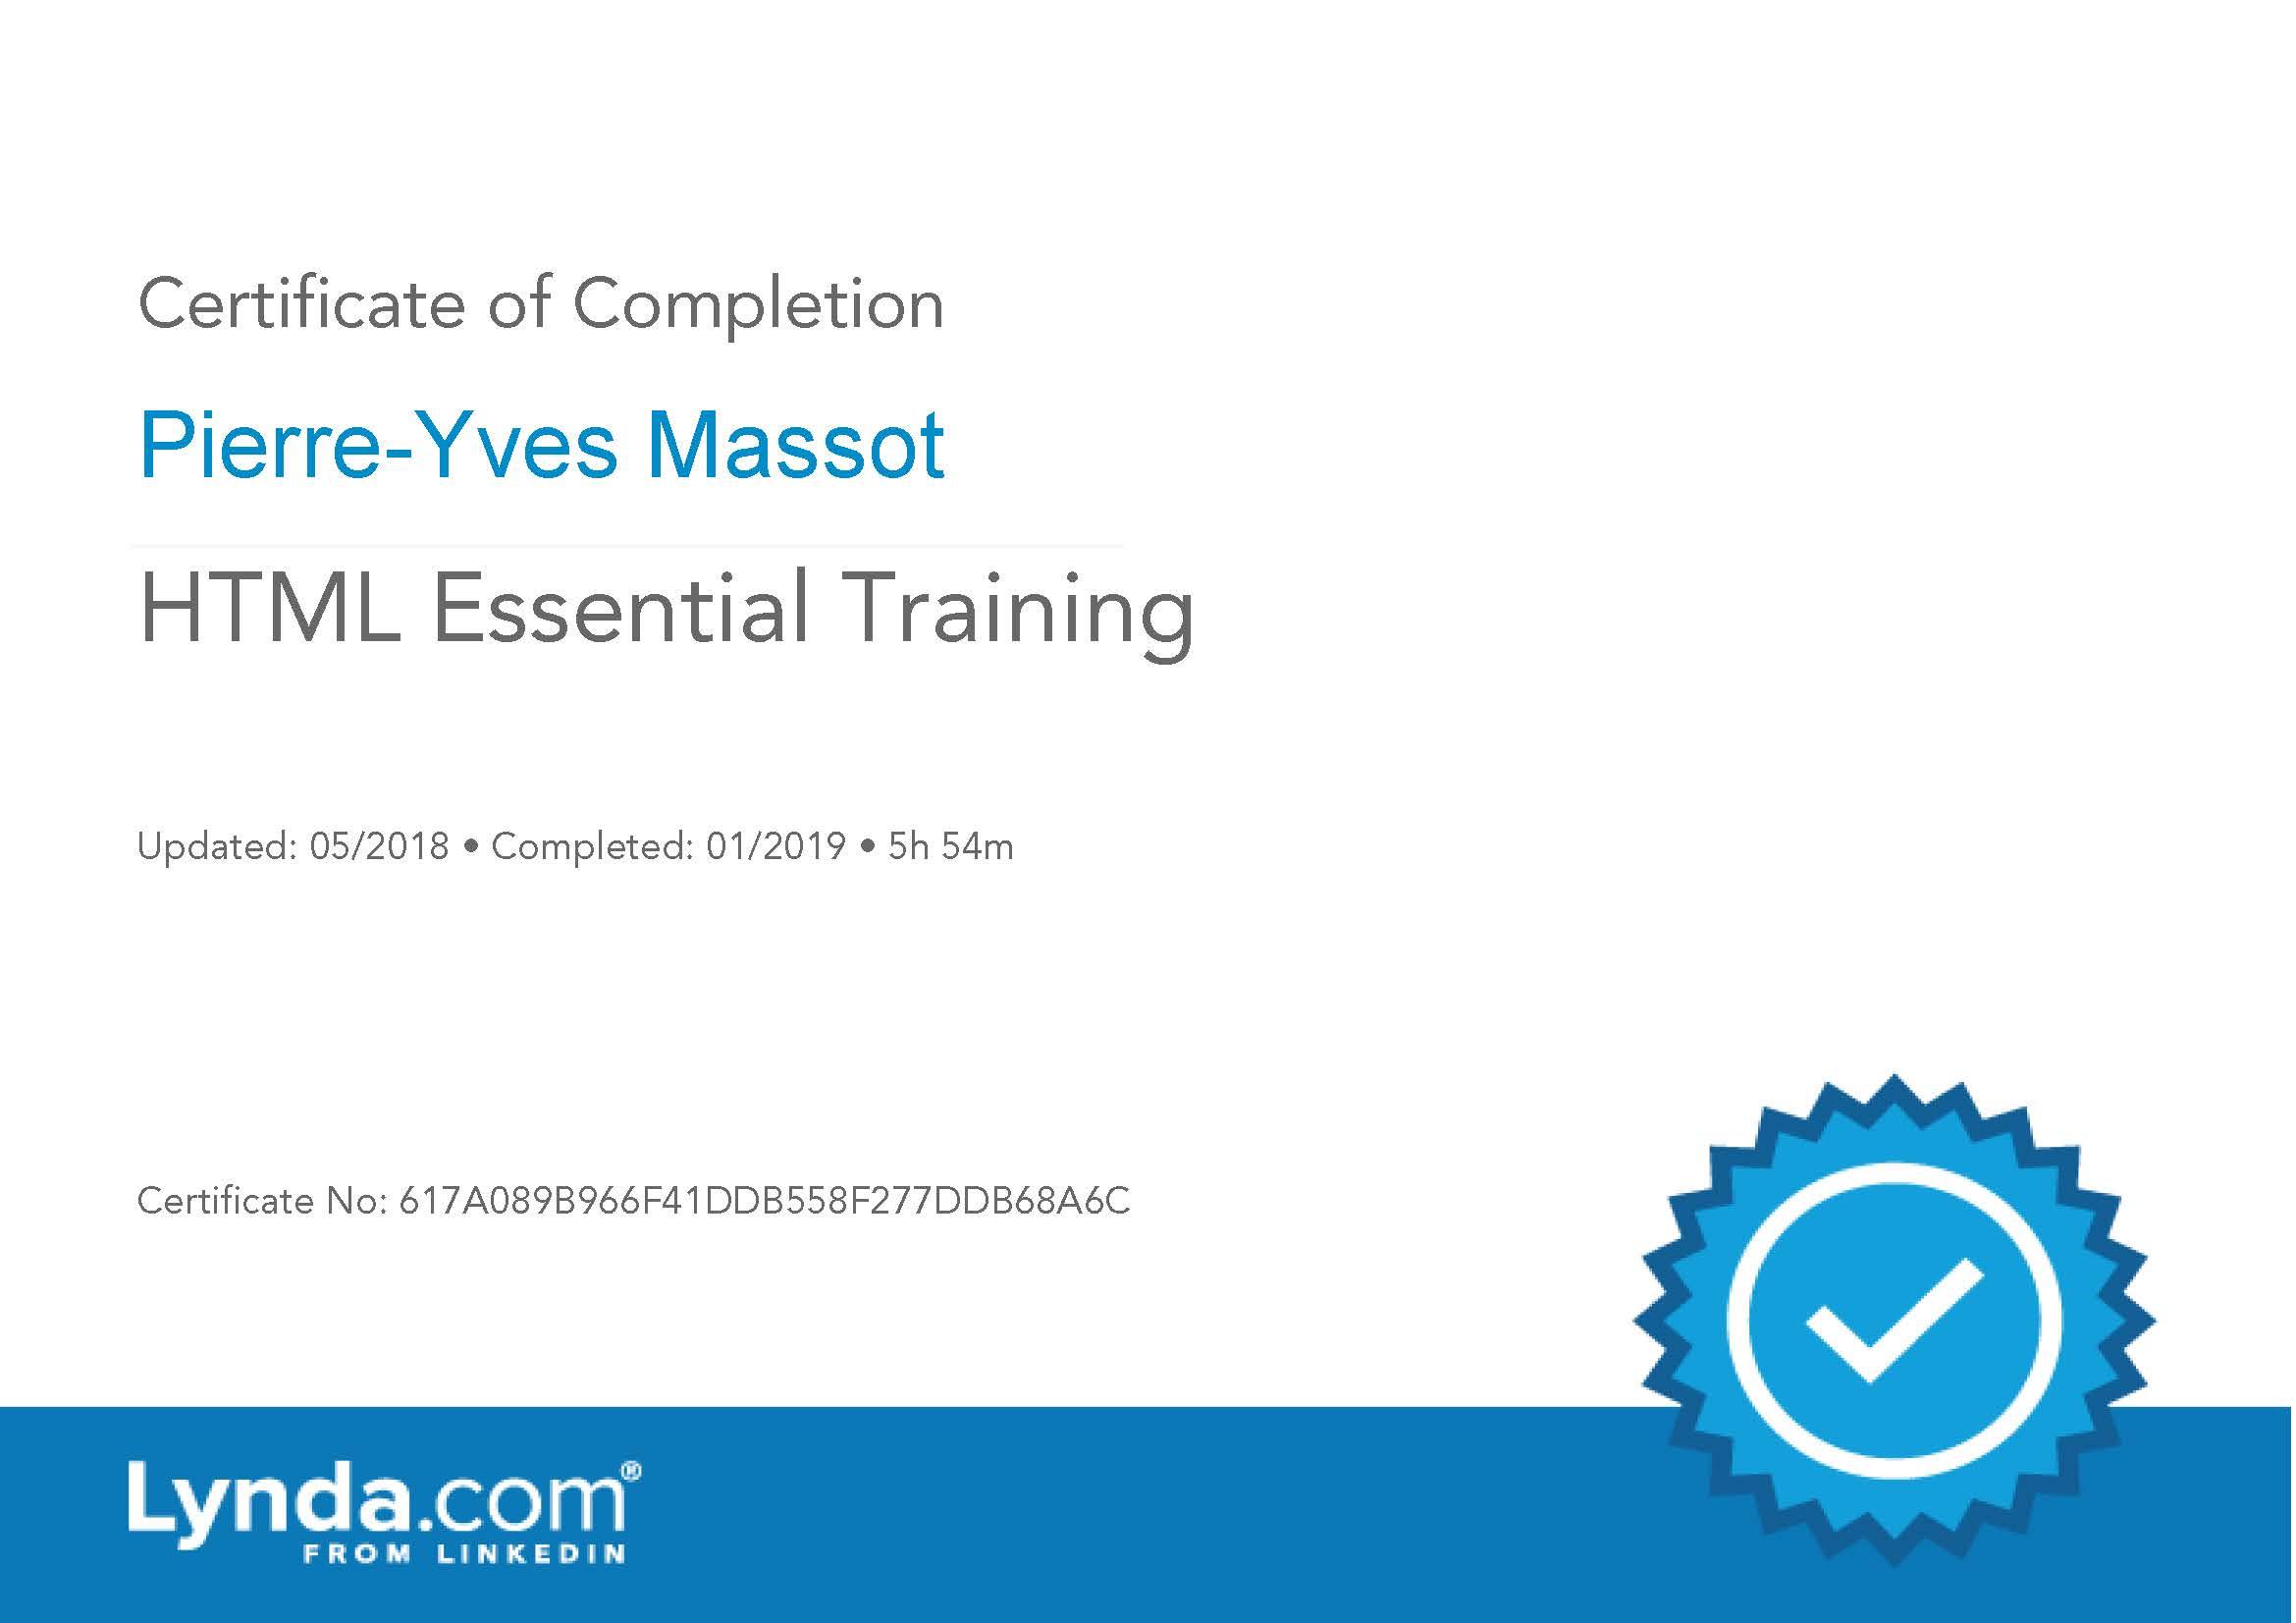 HTMLEssentialTraining_CertificateOfCompletion.jpg